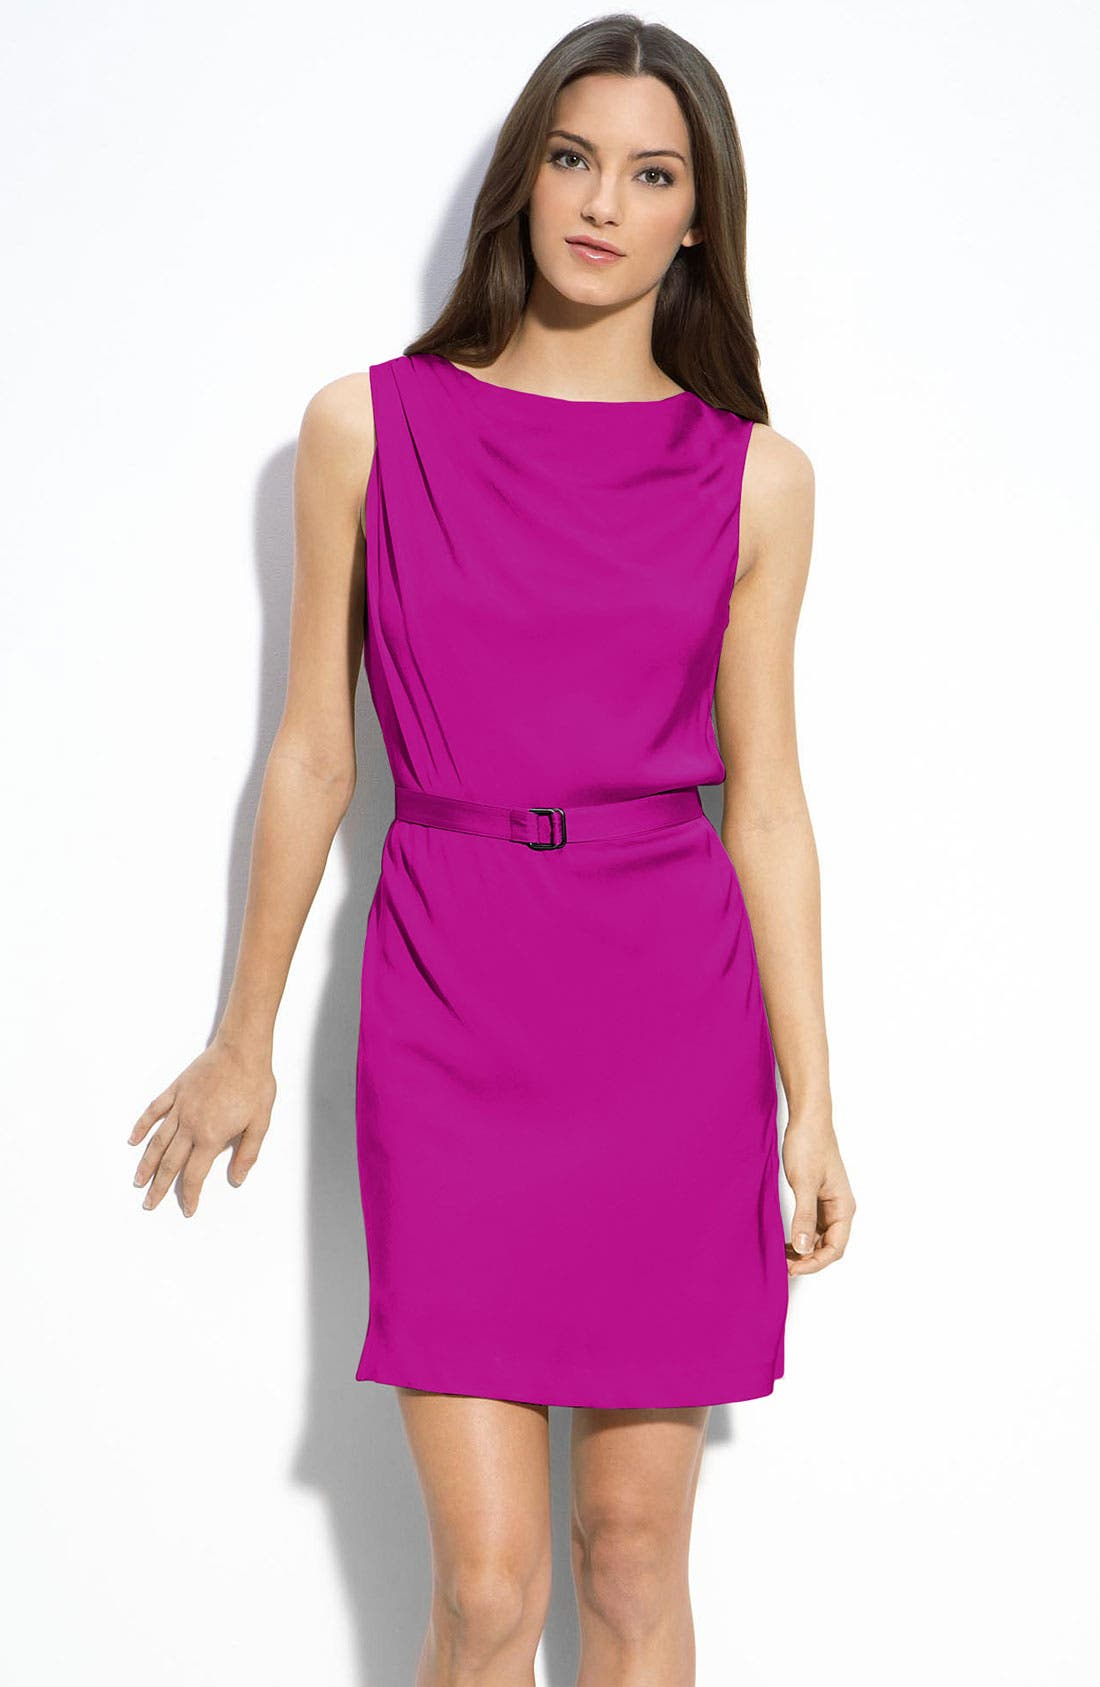 Alternate Image 1 Selected - Theory 'Elvinia - Disposition' Sleeveless Dress